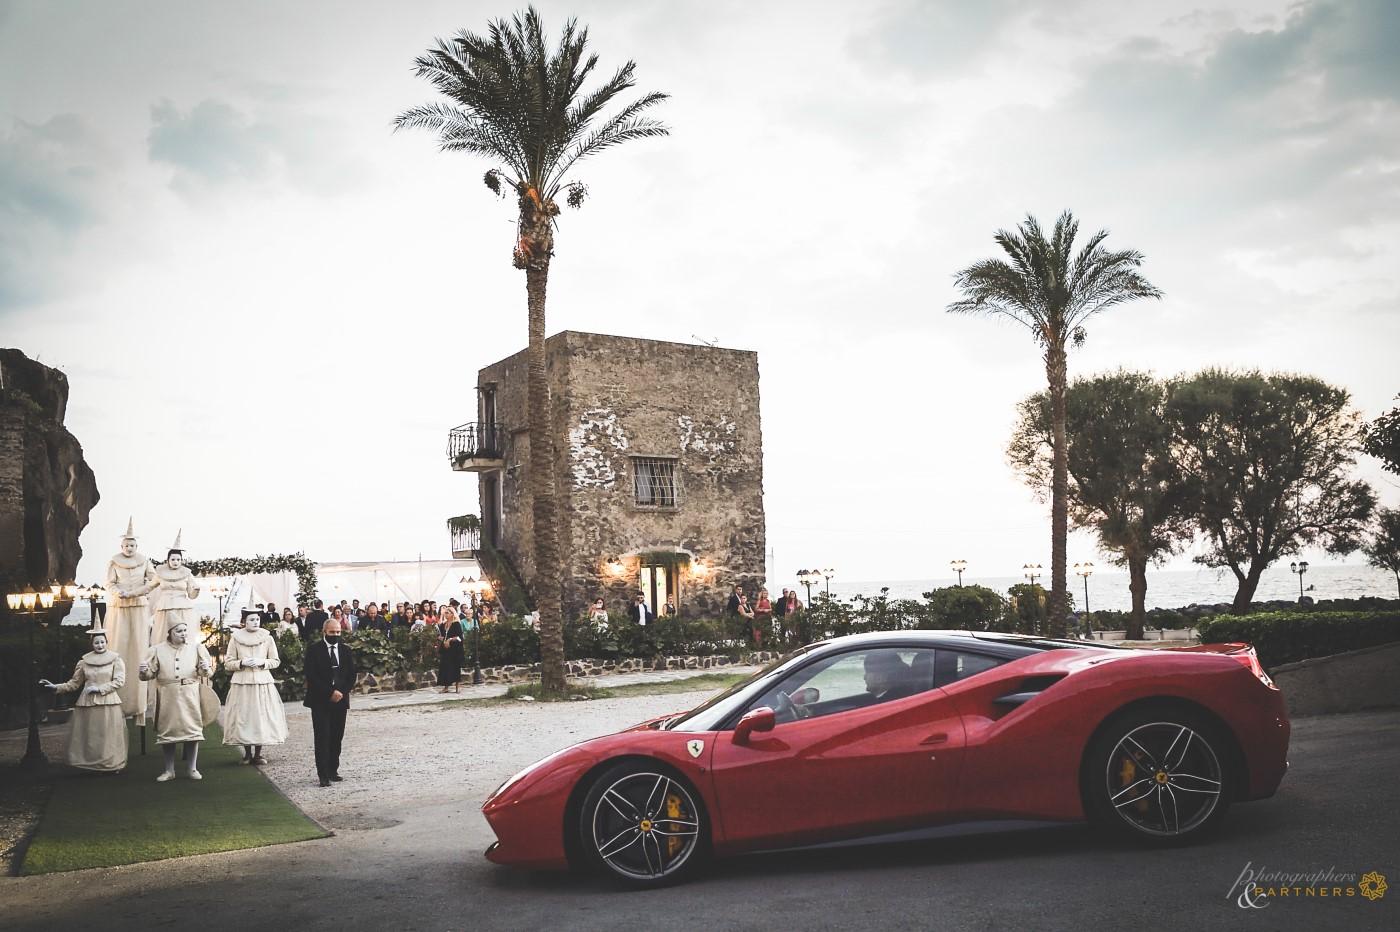 Errival at Torre Saracena of the Bride & Groom in Ferrari.